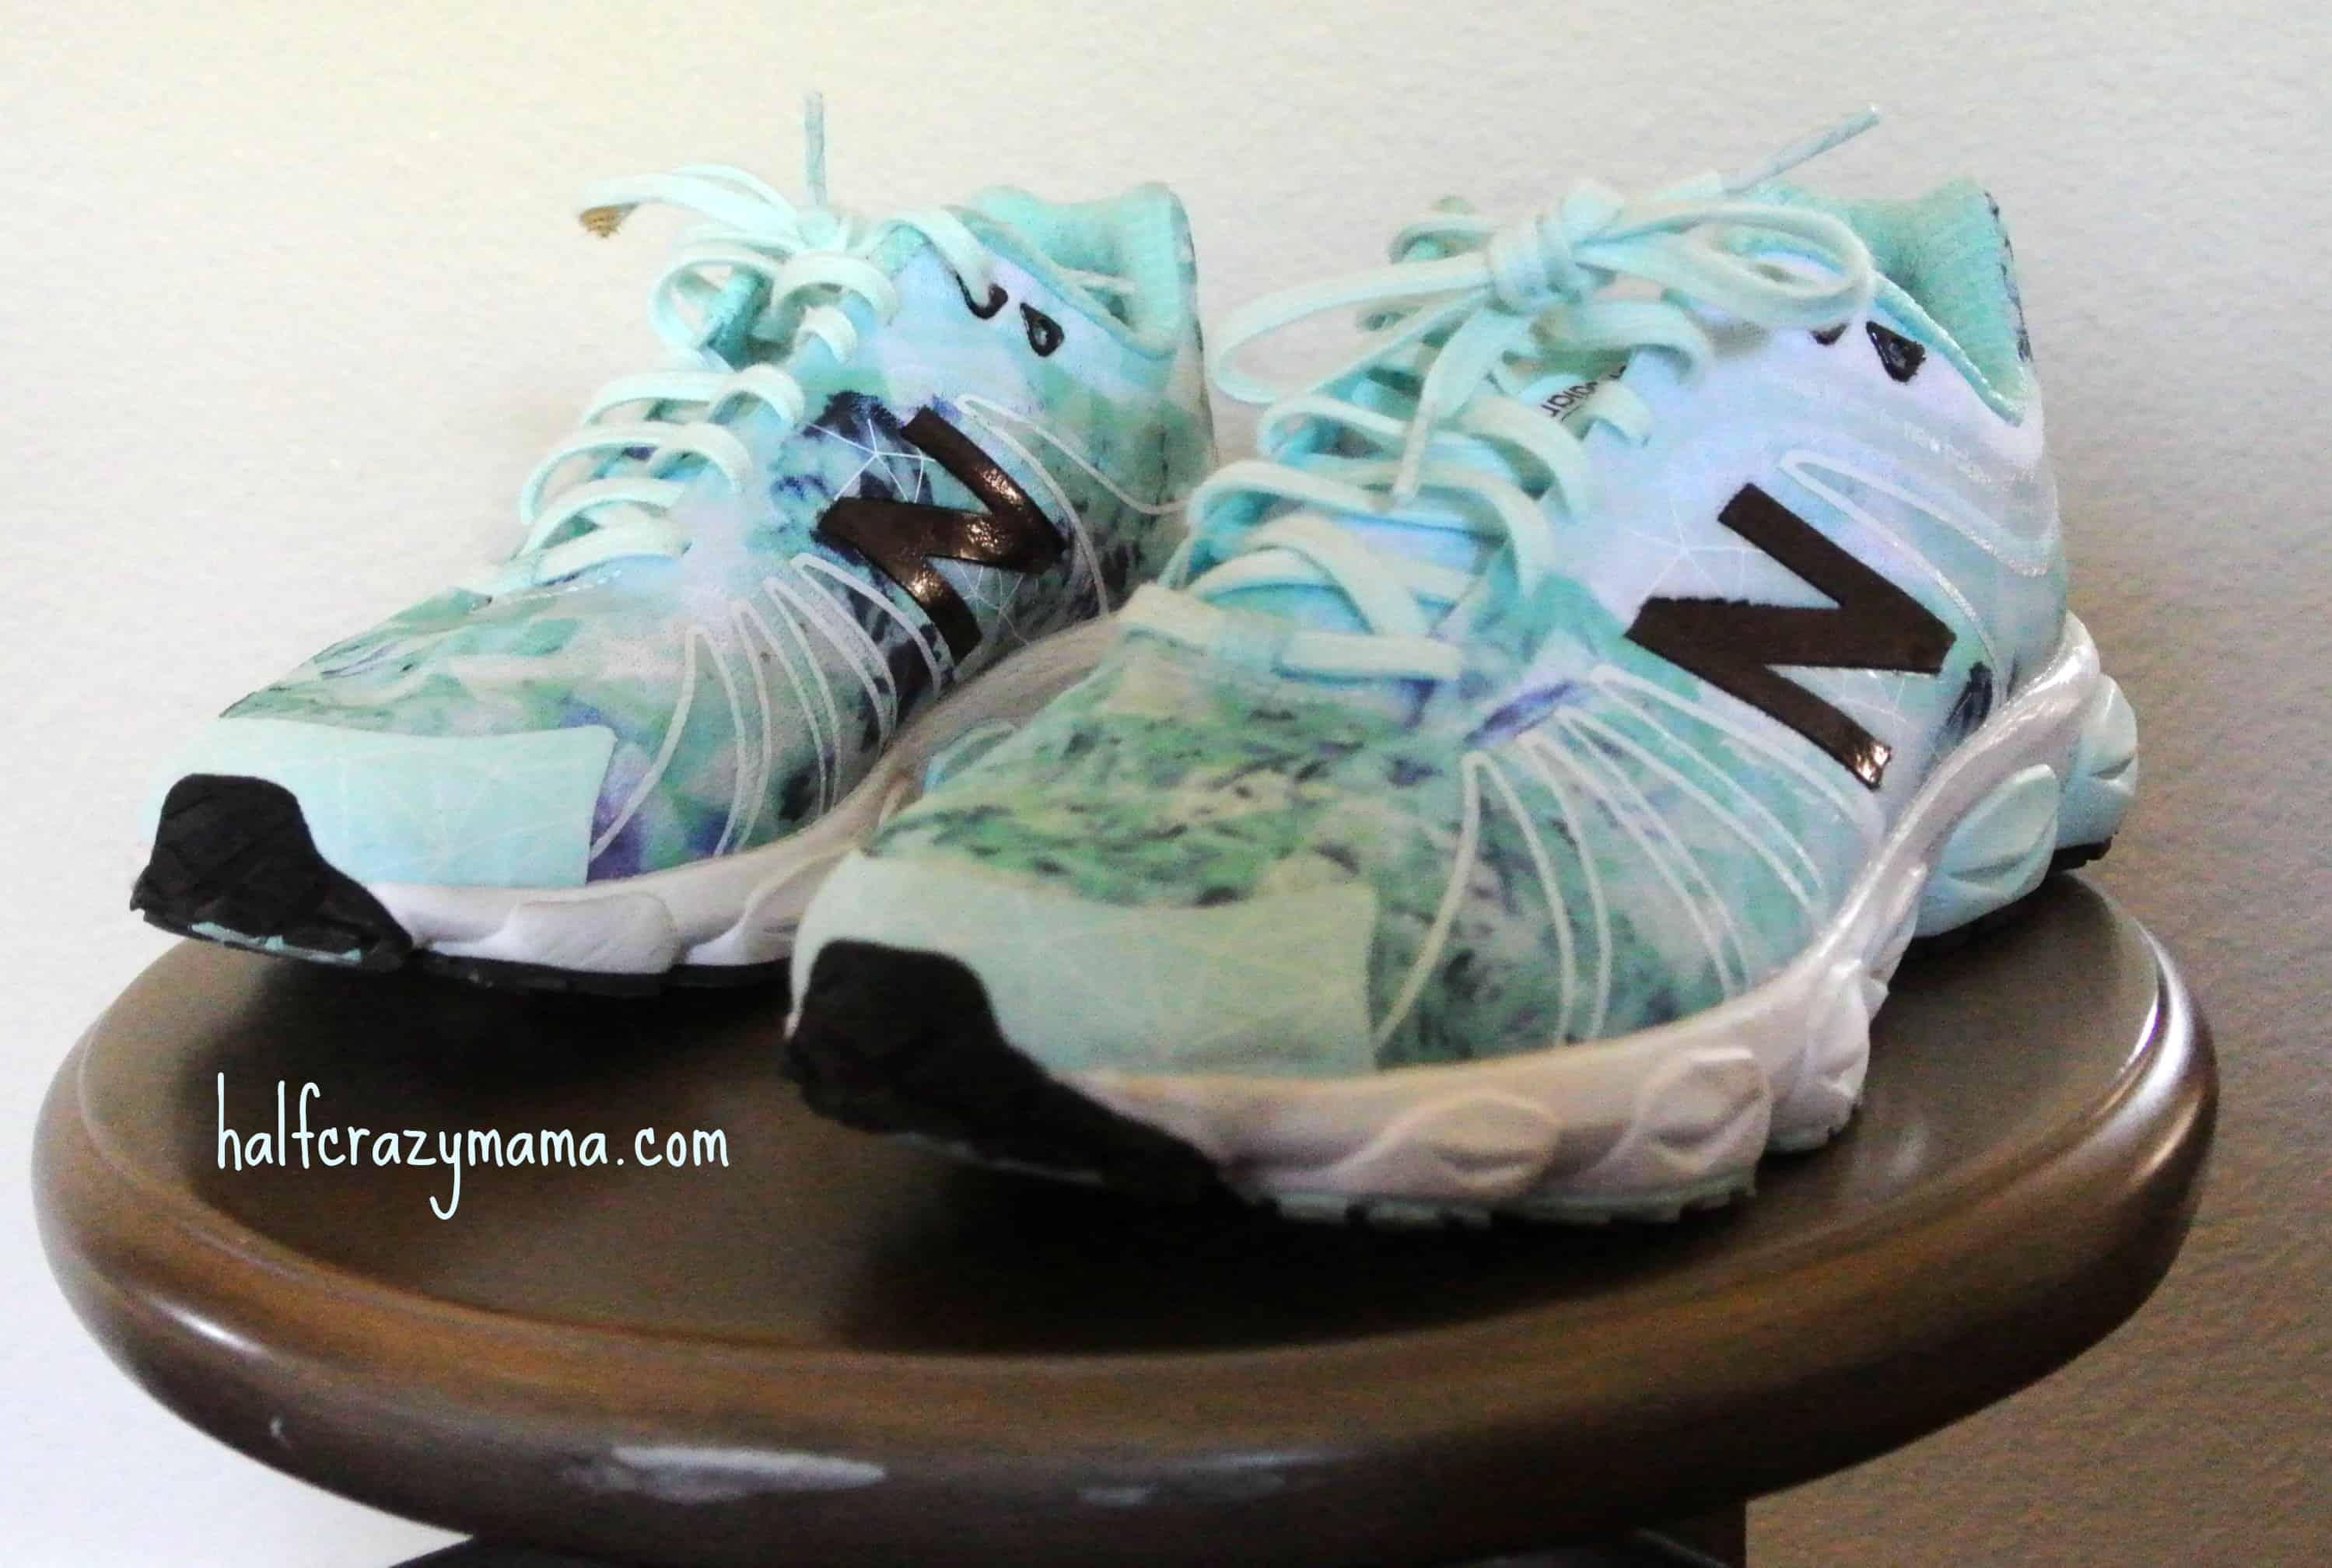 New Balance Heidi Klum Shoes Review